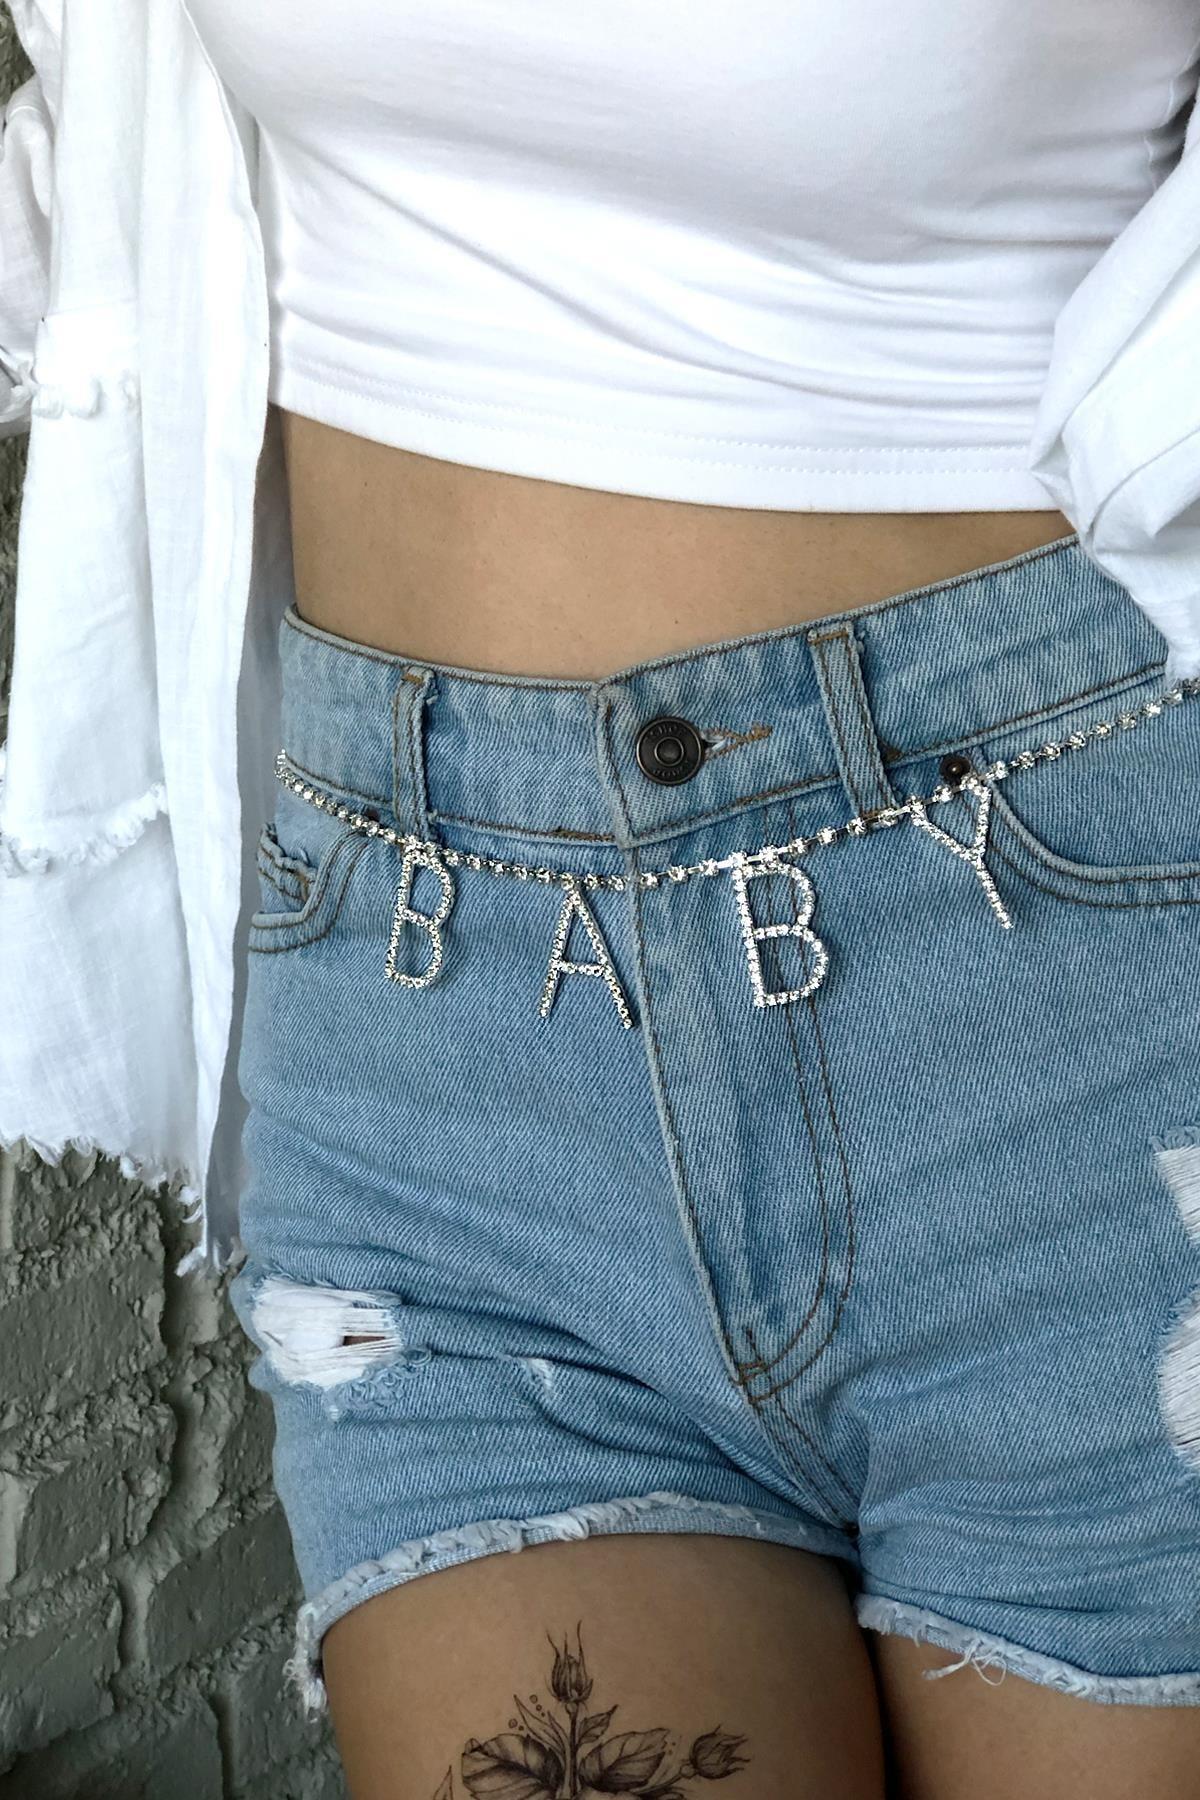 New Obsessions Kadın Baby Zincir Kemer TM-1199